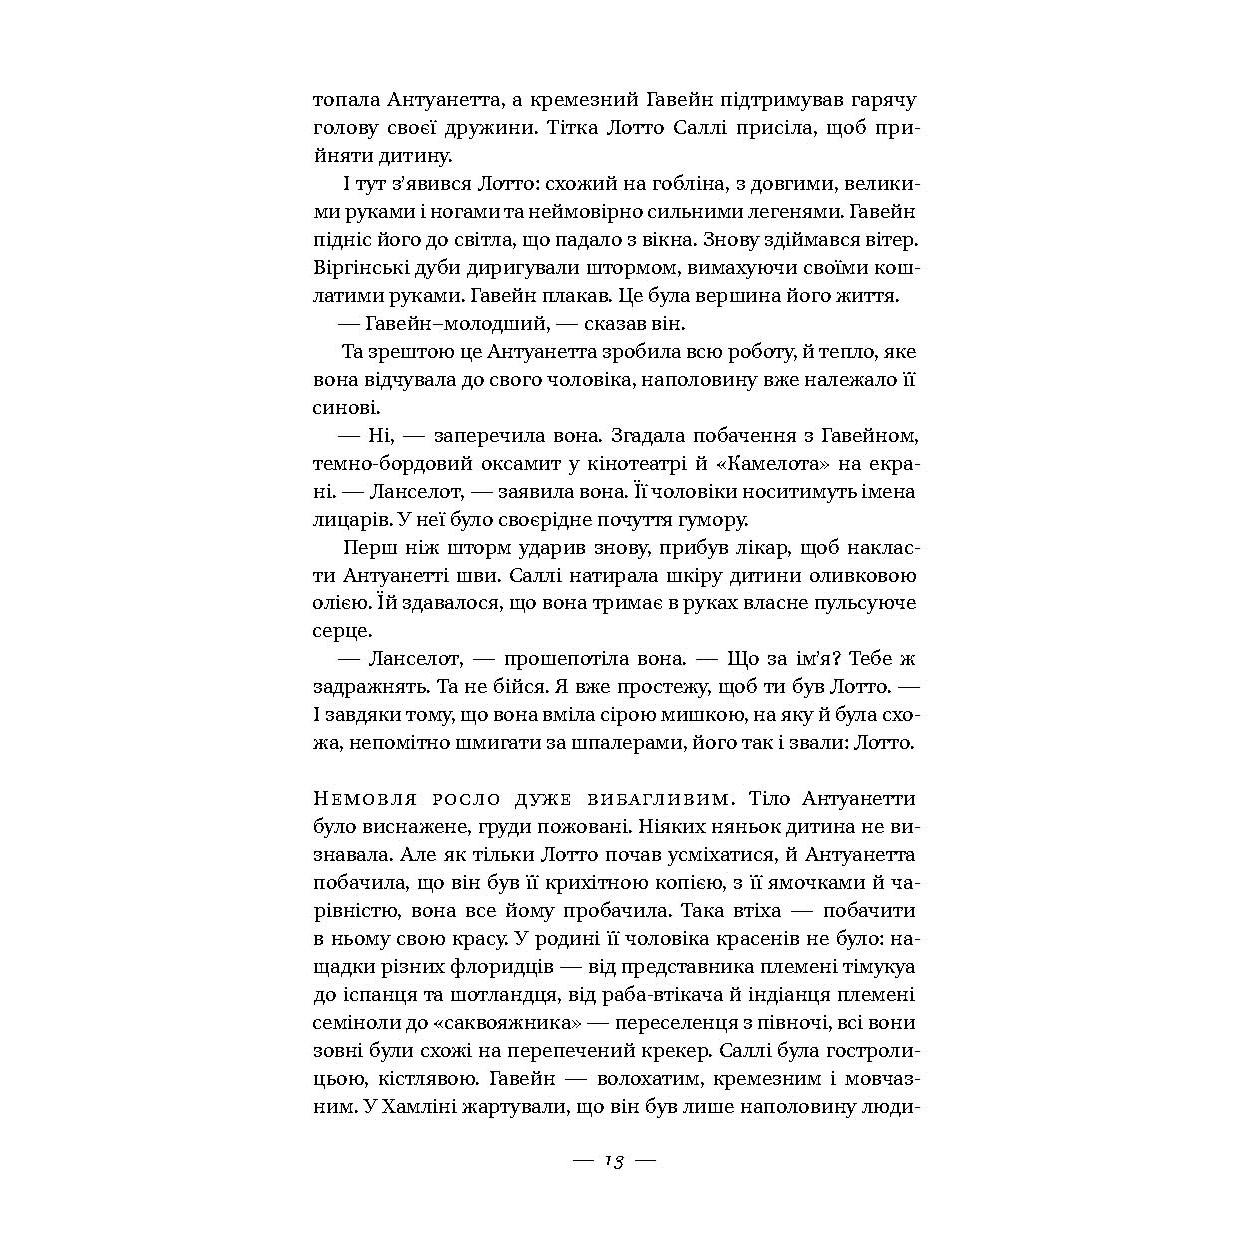 070_groff-lauren_doli-ta-furii_prev06